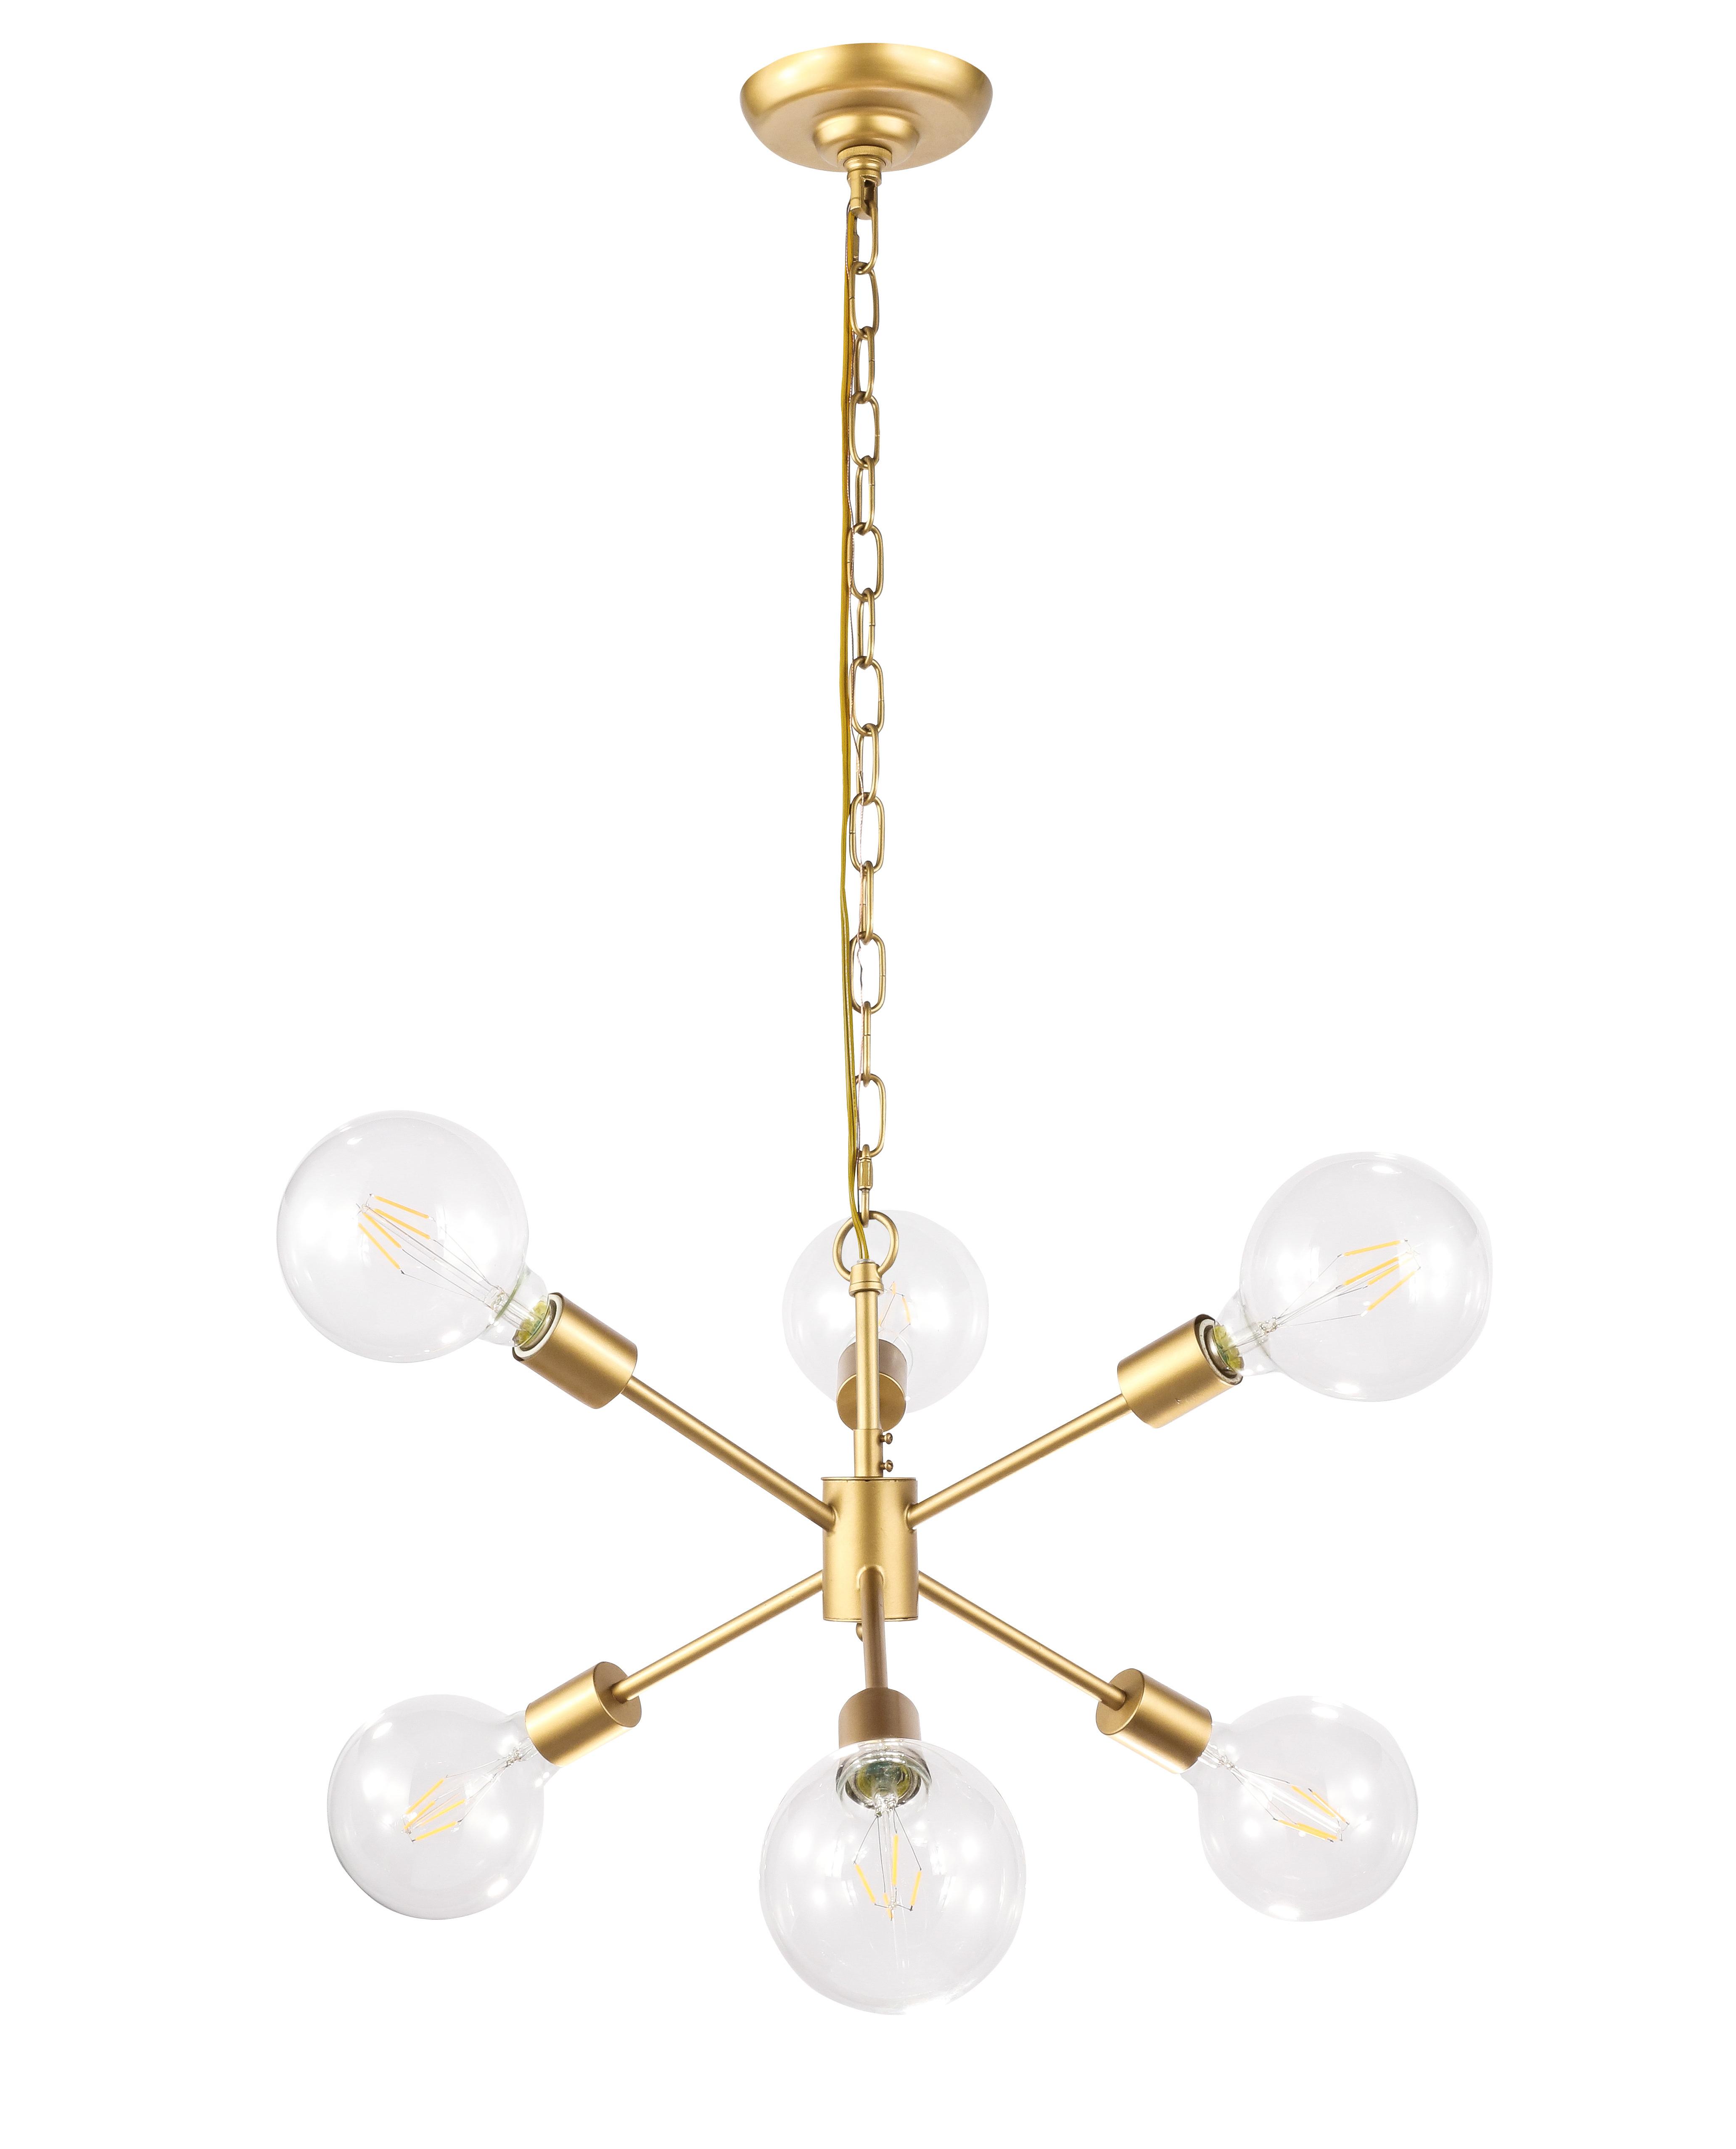 Most Recently Released Velva 6 Light Sputnik Chandelier Throughout Johanne 6 Light Sputnik Chandeliers (View 9 of 20)